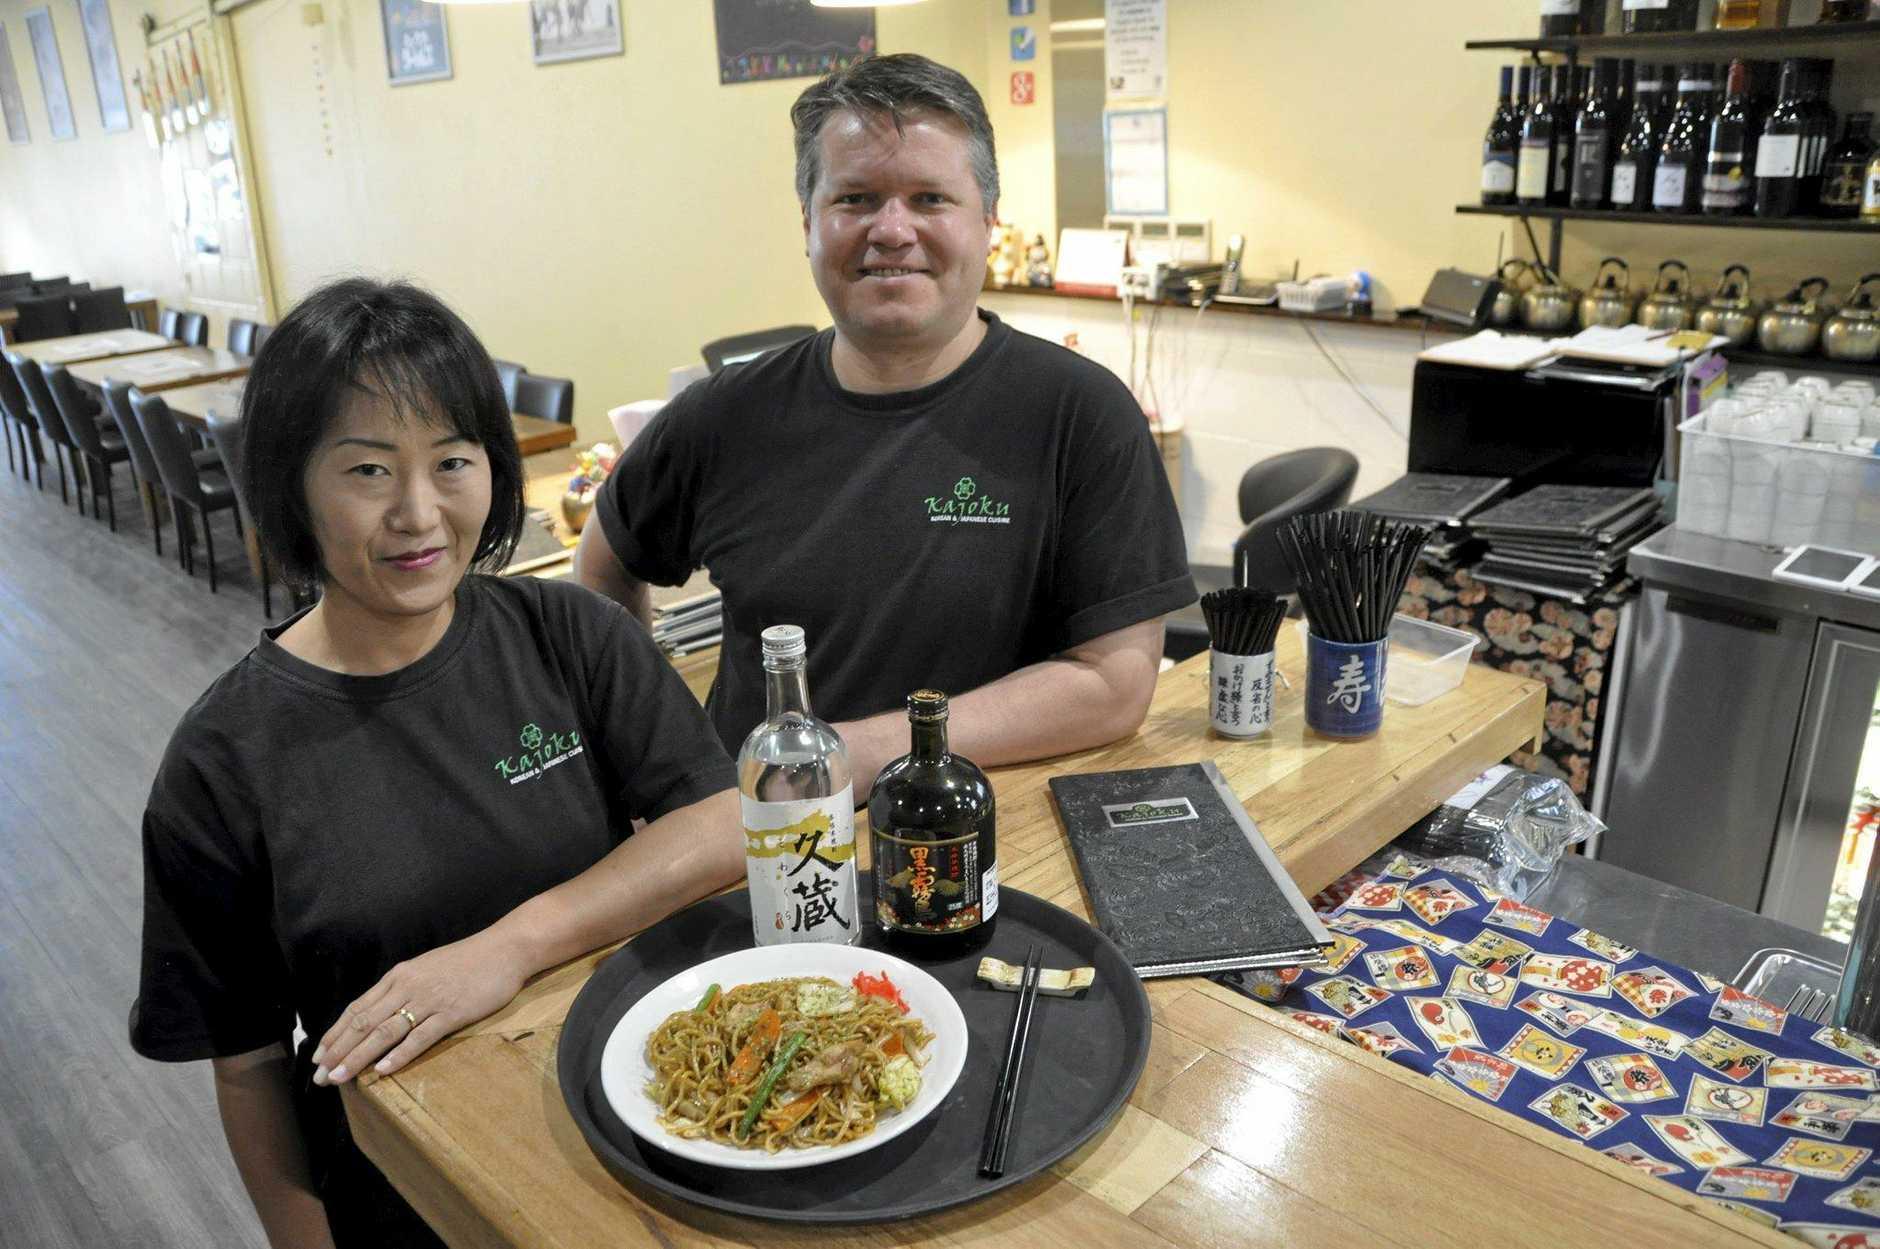 Kajoku's Mitsuko Bain (left) and Jeff Brady with a Yaki Soba dish.